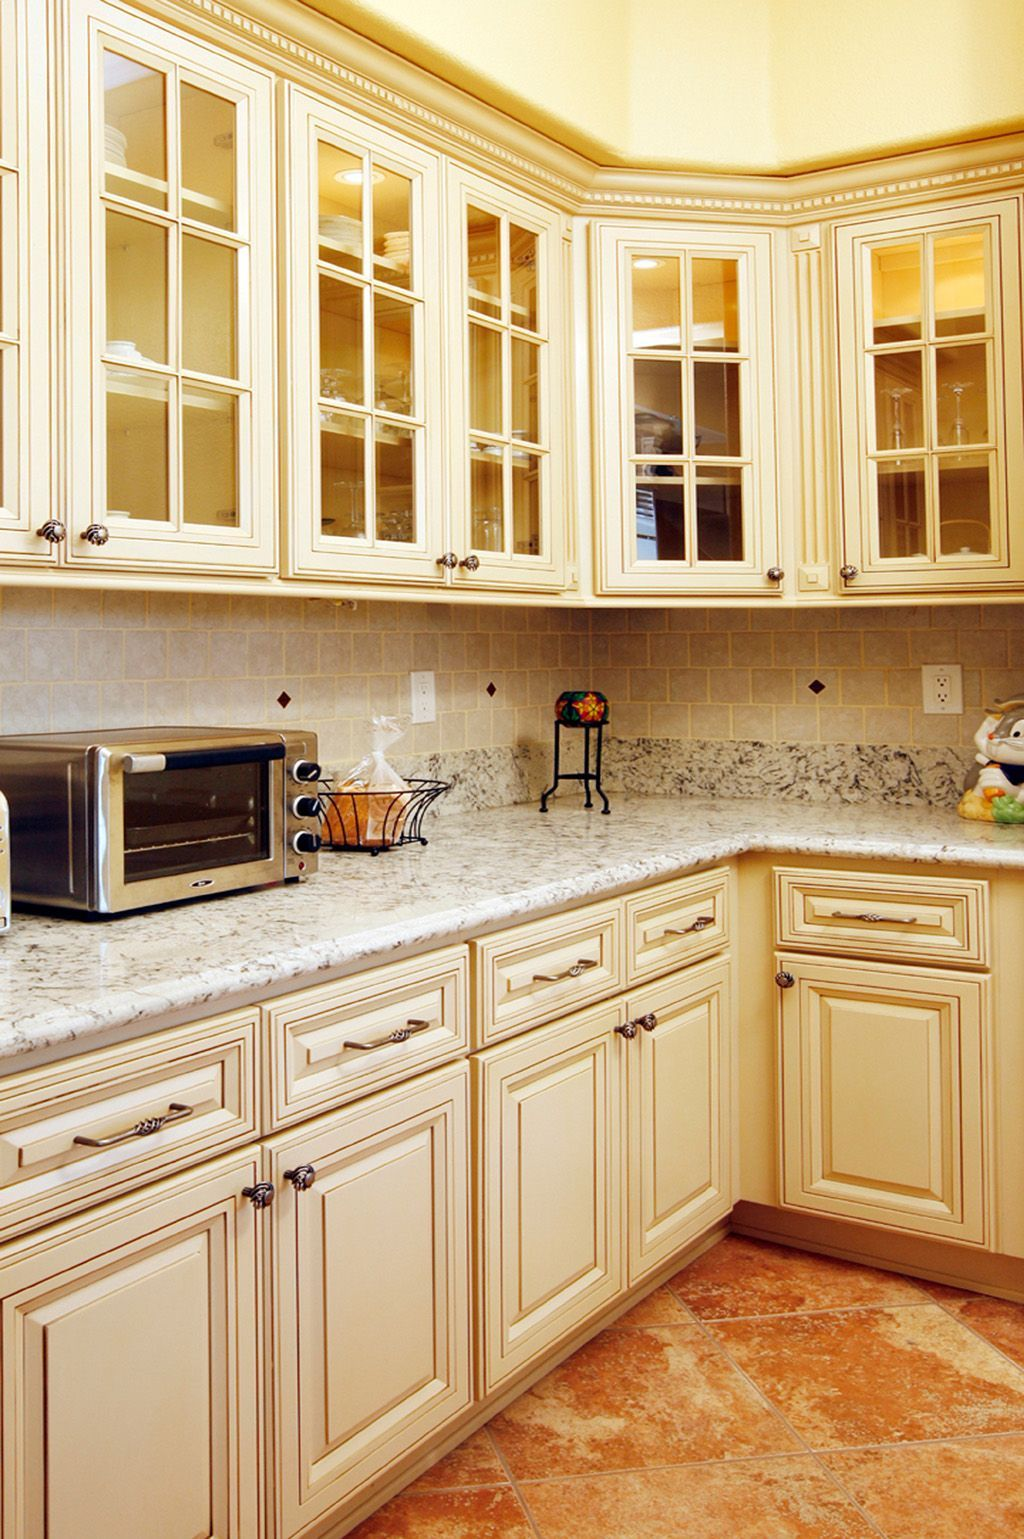 stunning antique white glazed kitchen cabinets design ideas kitchen cabinet styles glass on kitchen cabinets not white id=81031